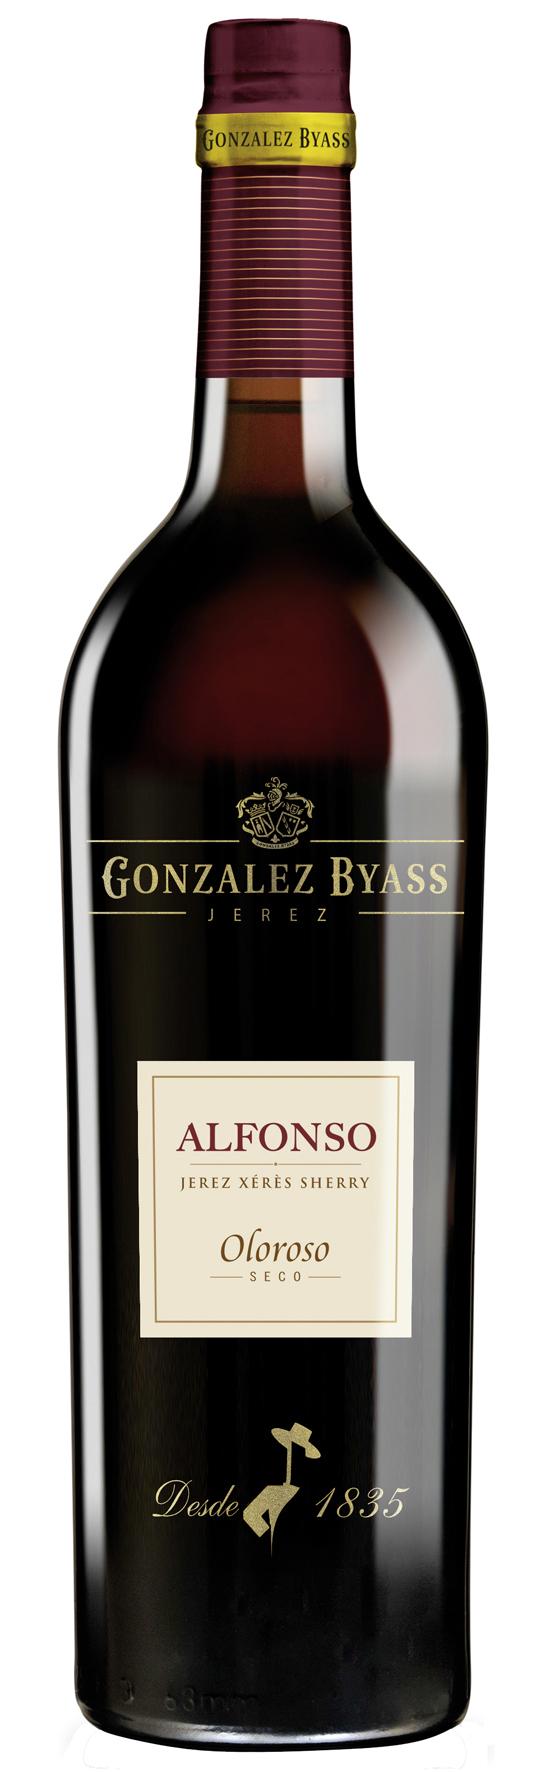 Oloroso Seco -Alfonso- Sherry, Gonzalez Byass